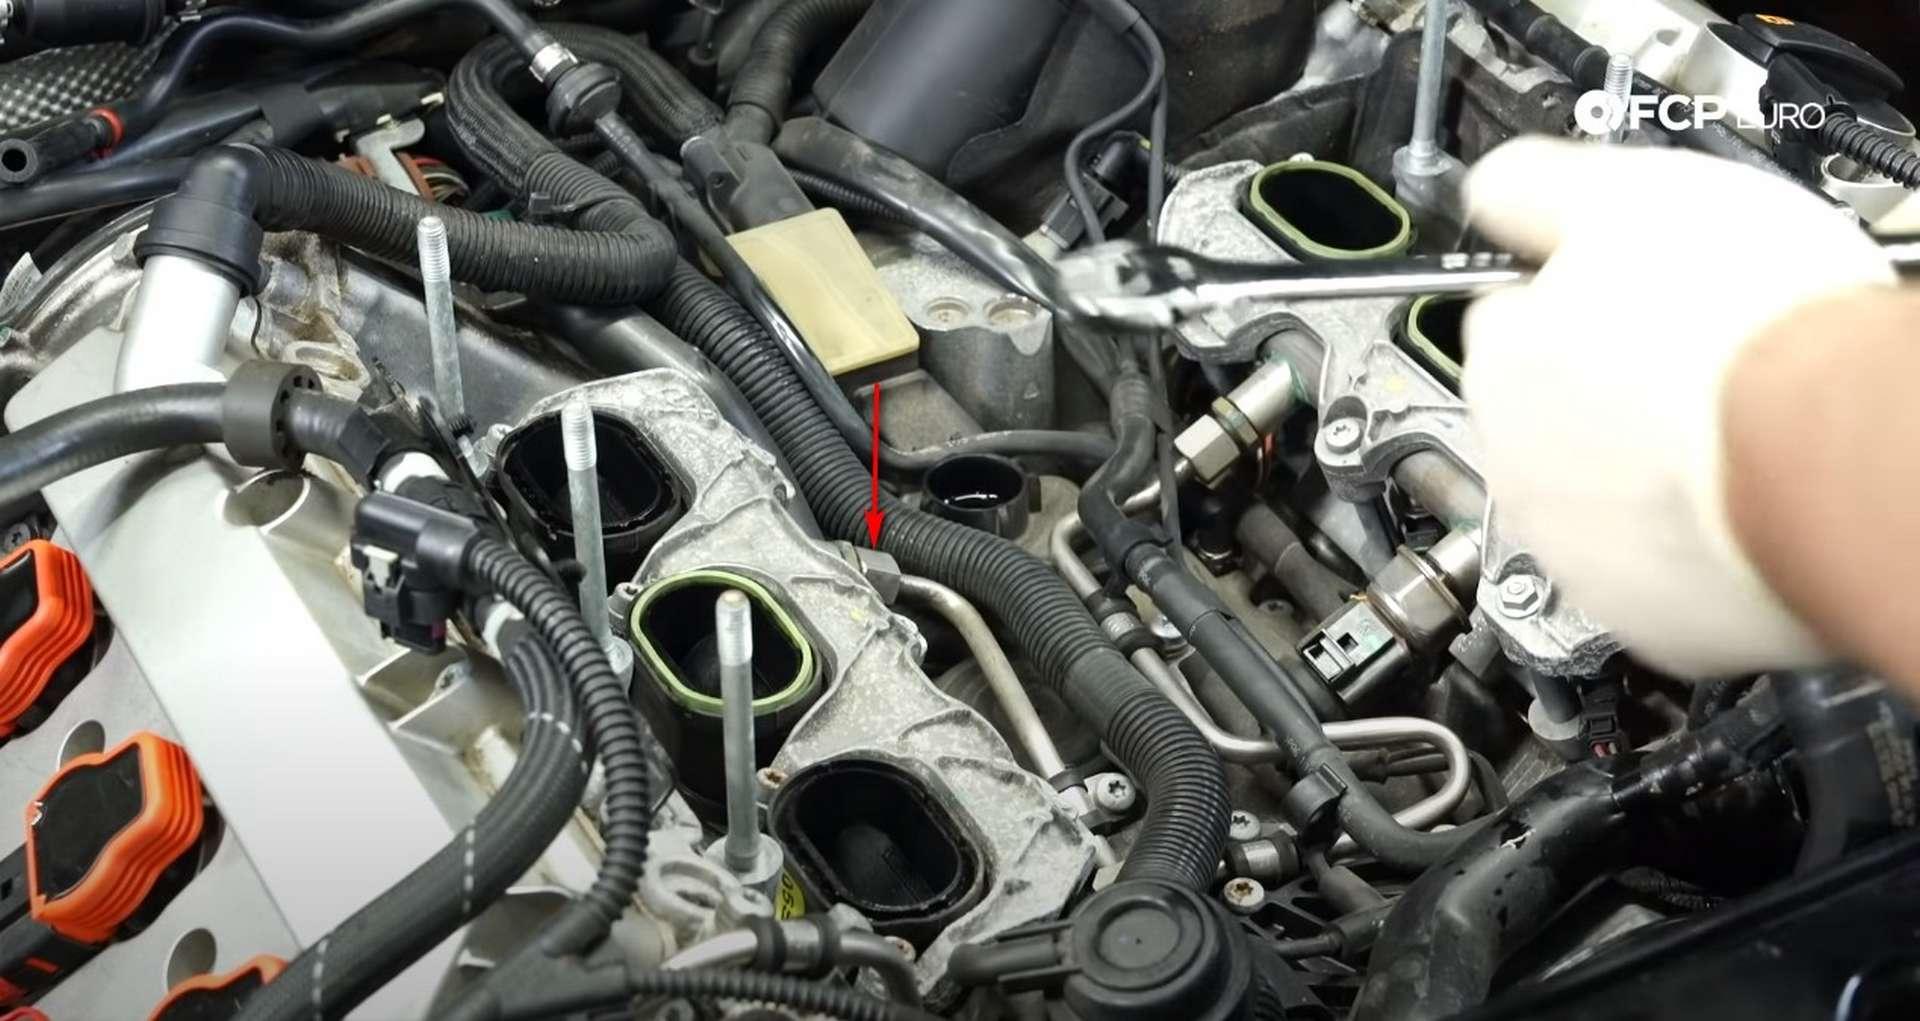 DIY Audi 3.0t Walnut Blasting Intake Valves manifold fuel line connection location